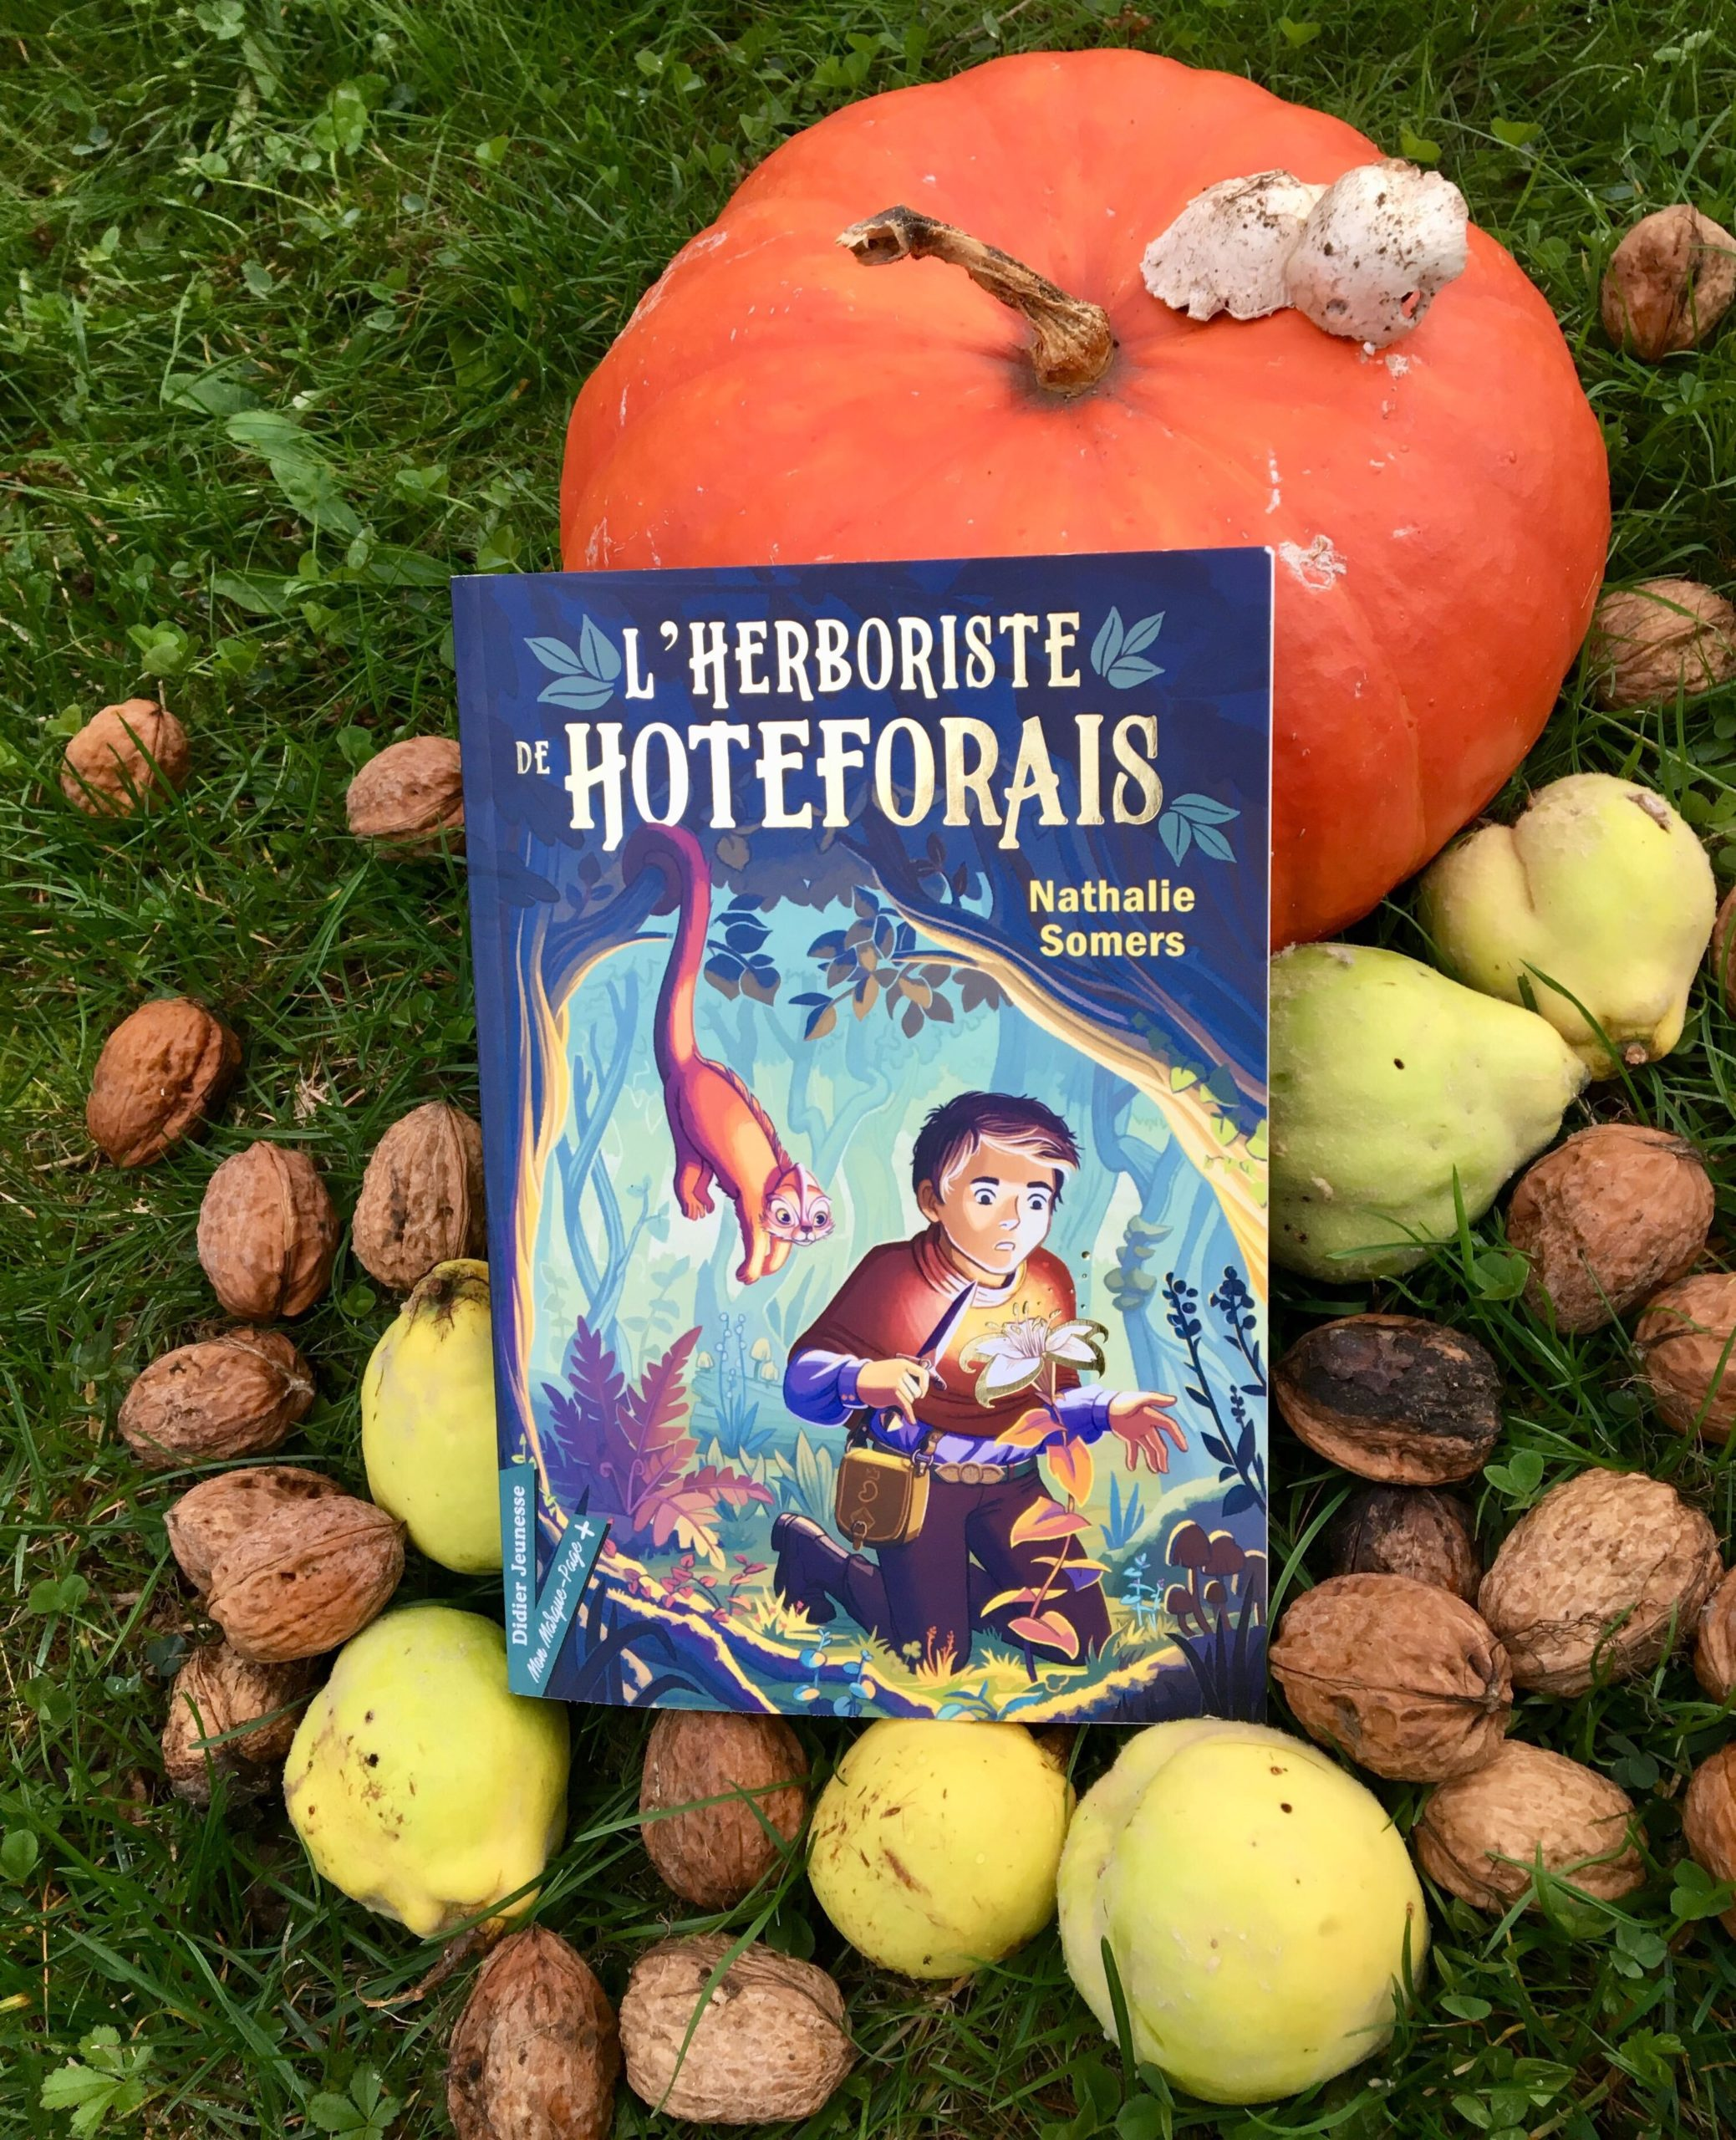 Livre herboriste : L herboriste de Hoteforais de Nathalie Somers